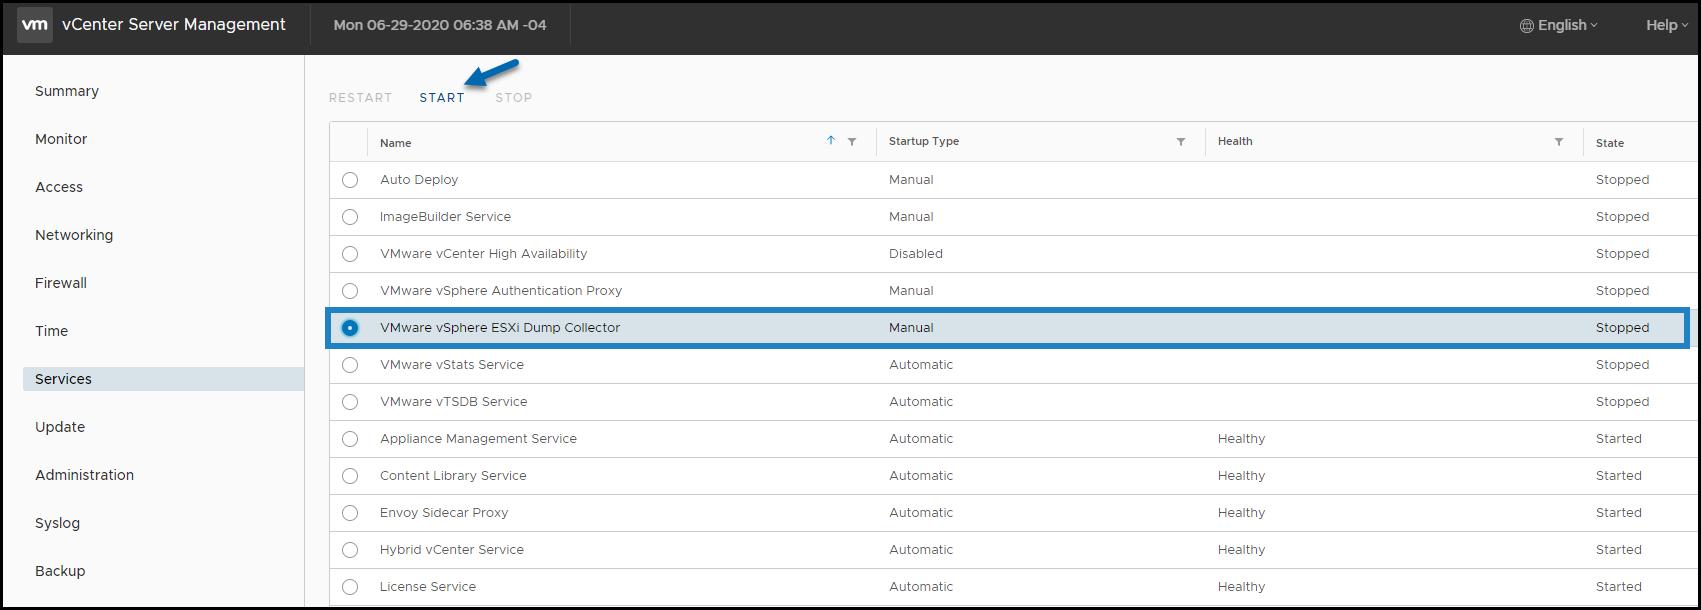 VMware ESXi Dump Collector - Start the service